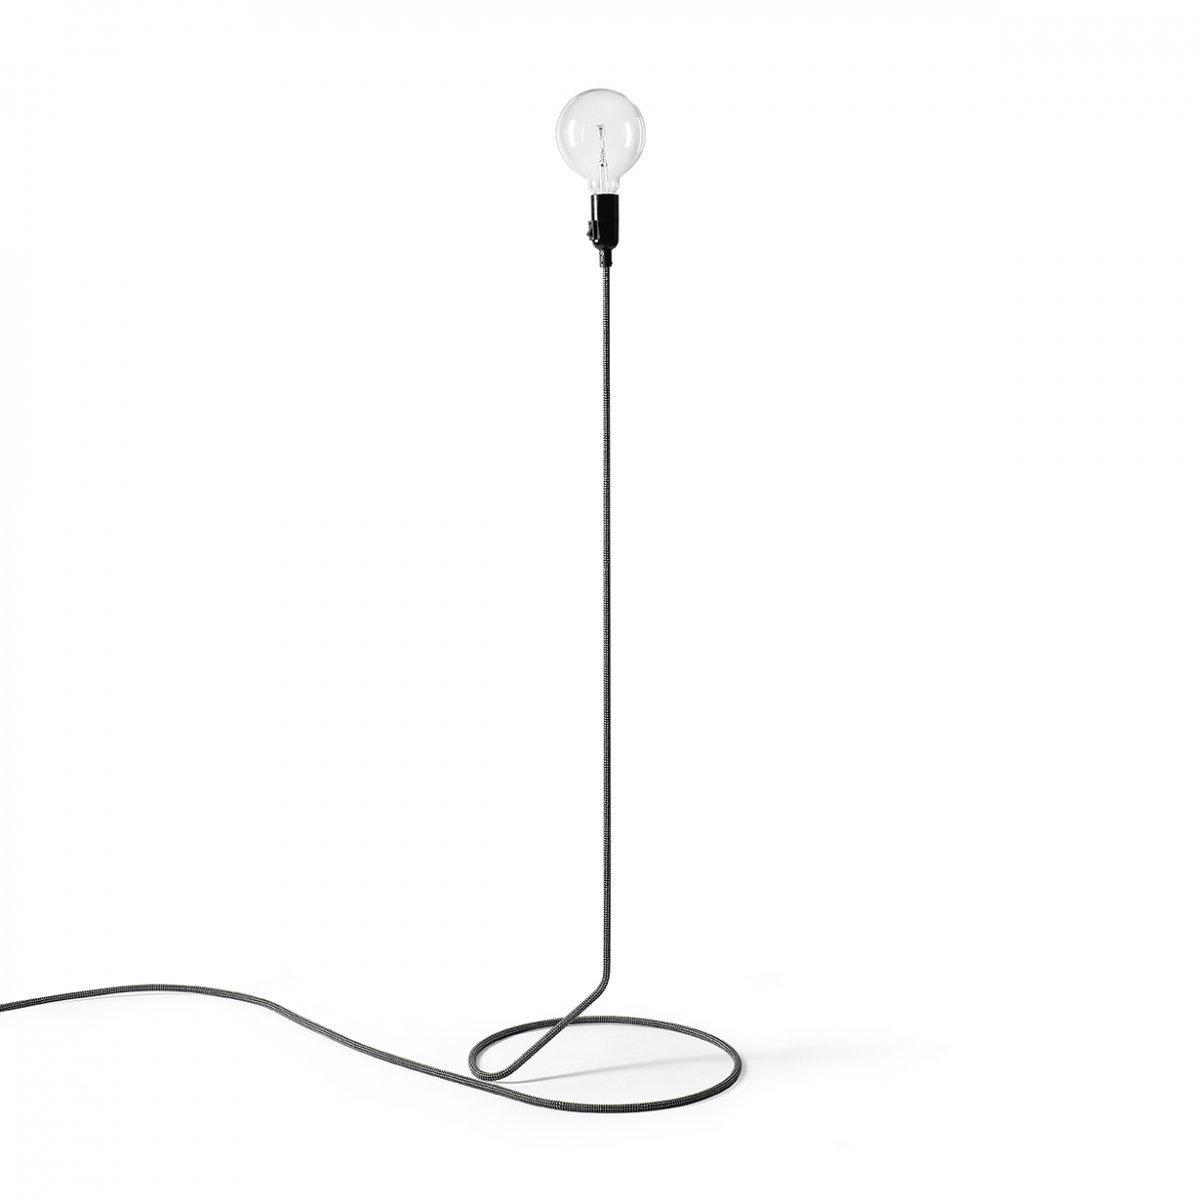 Lampada da terra cord by design house stockholm lovethesign - Lampada da terra design ...